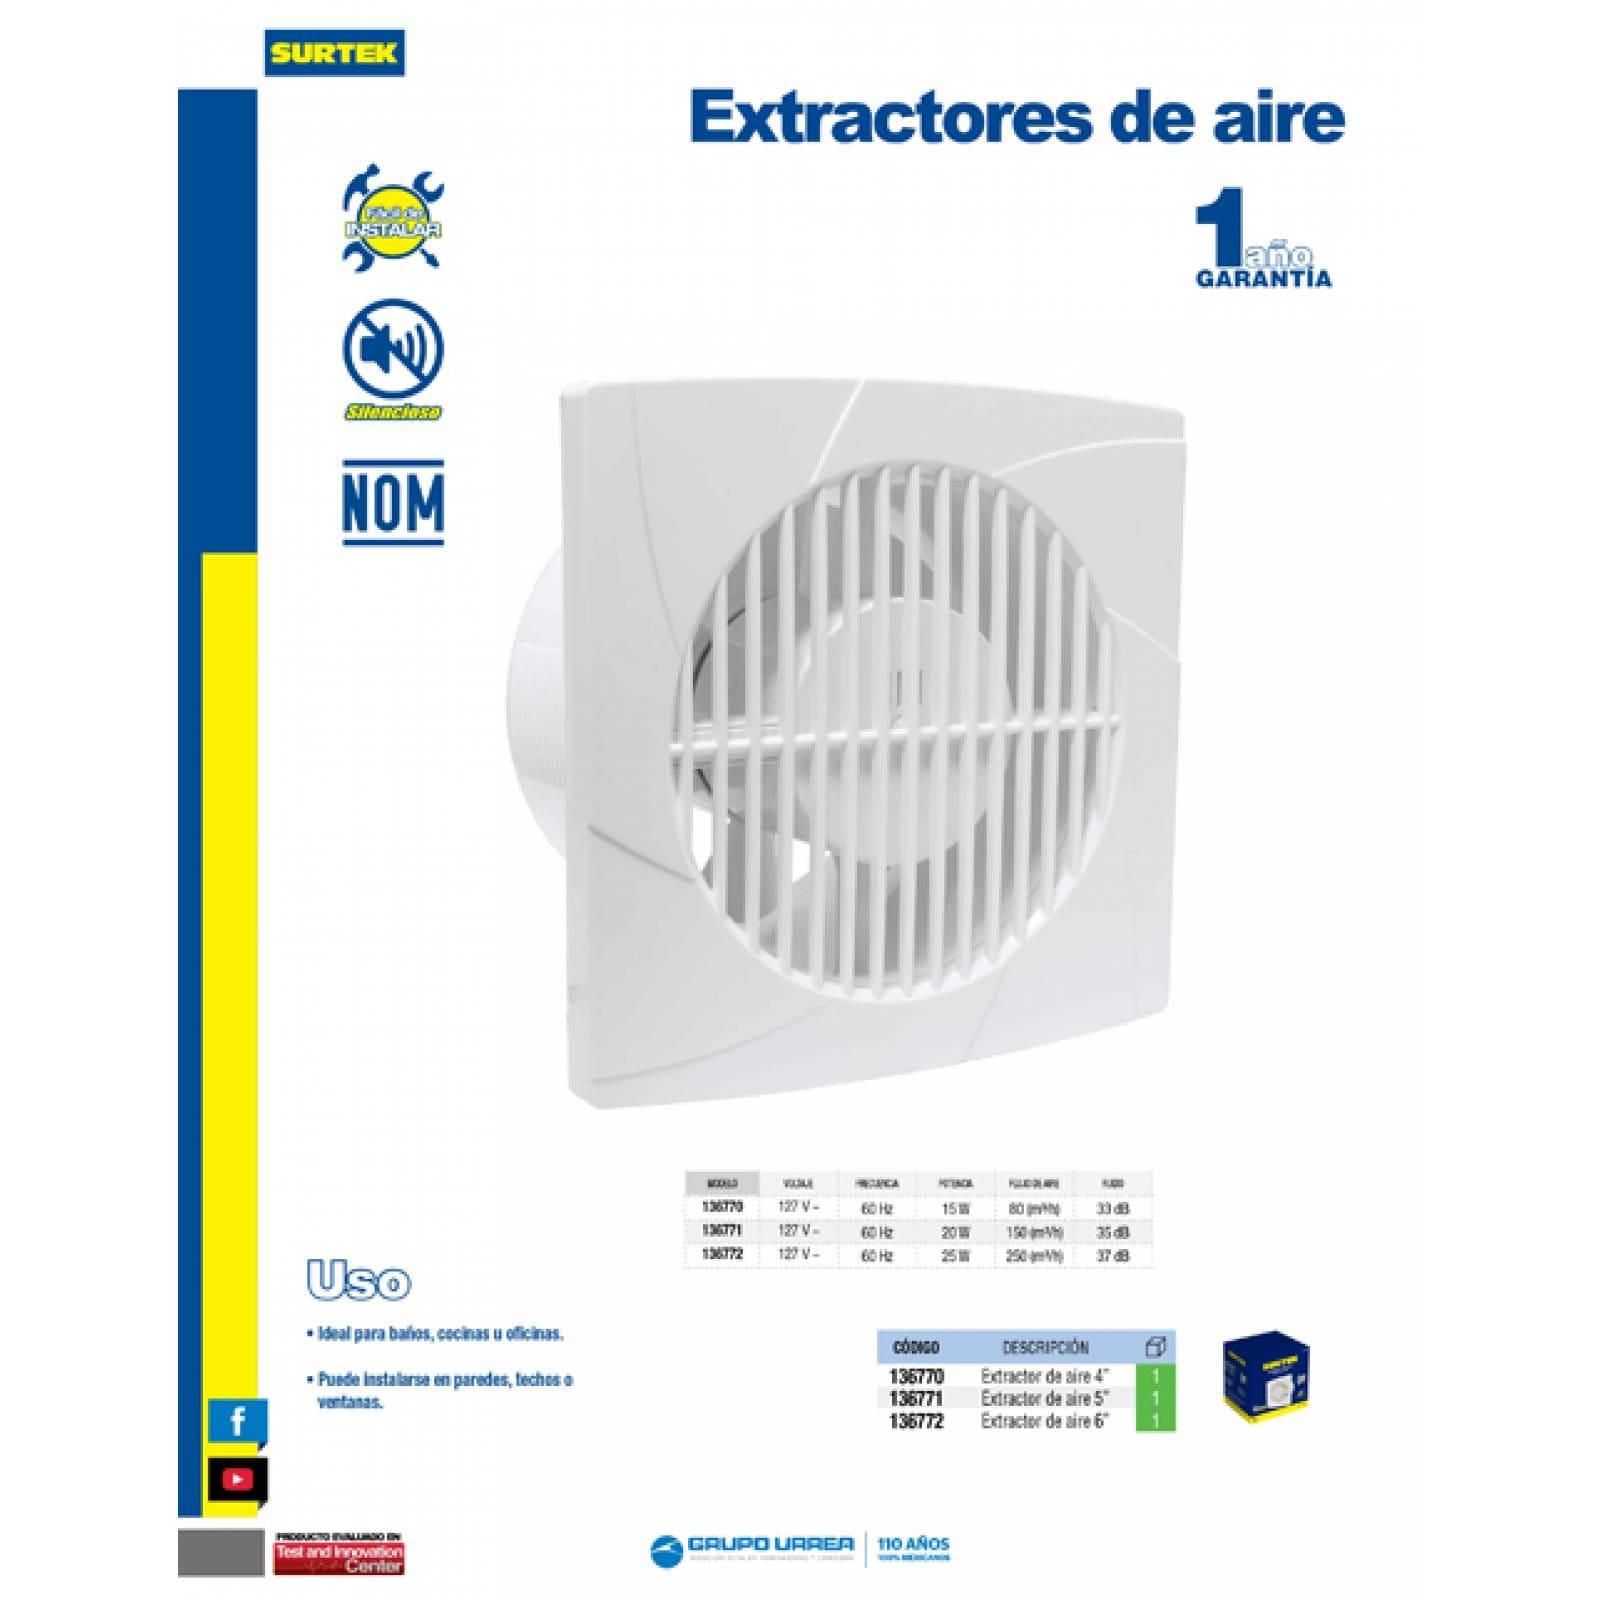 Extractores De Aire 4 Pulgadas 136770 Surtek